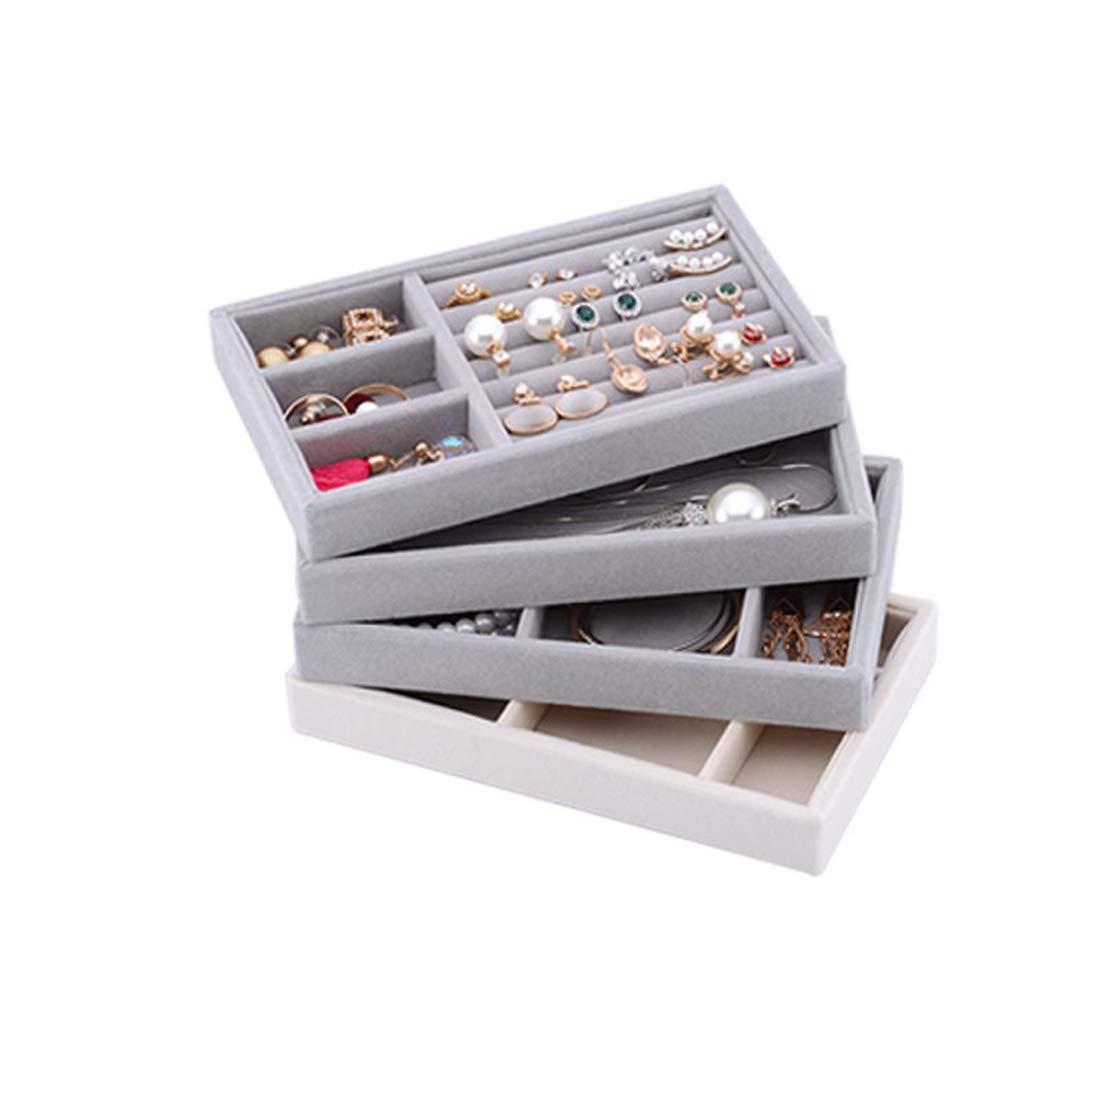 YFLY Ring Jewellery Display Storage Box Tray Show Case Organiser Earring Holder